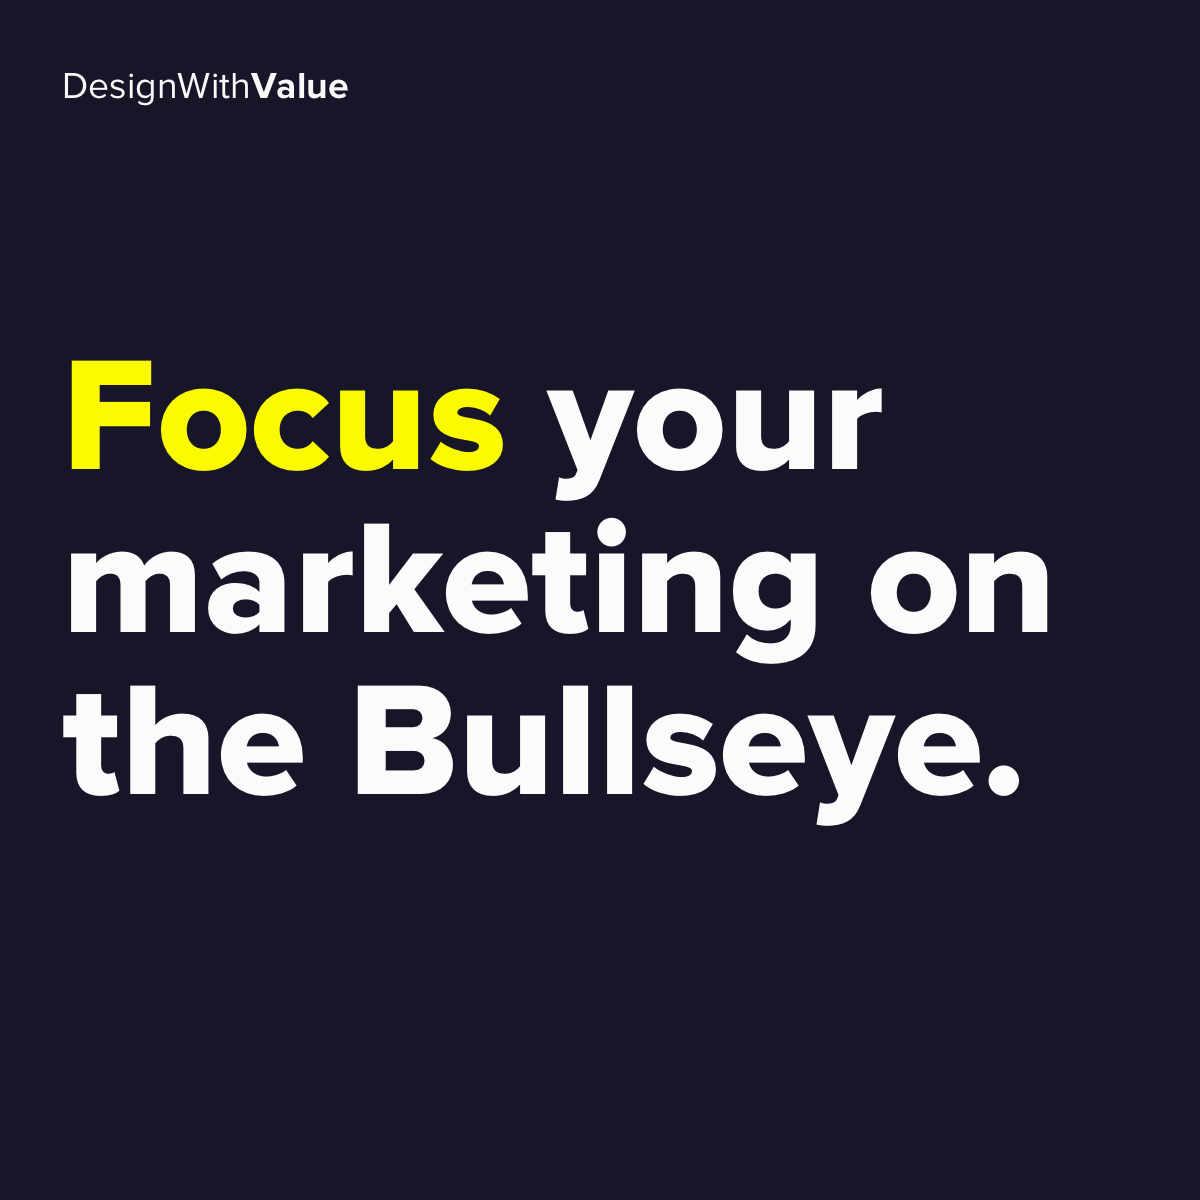 Focus your marketing on the bullseye.